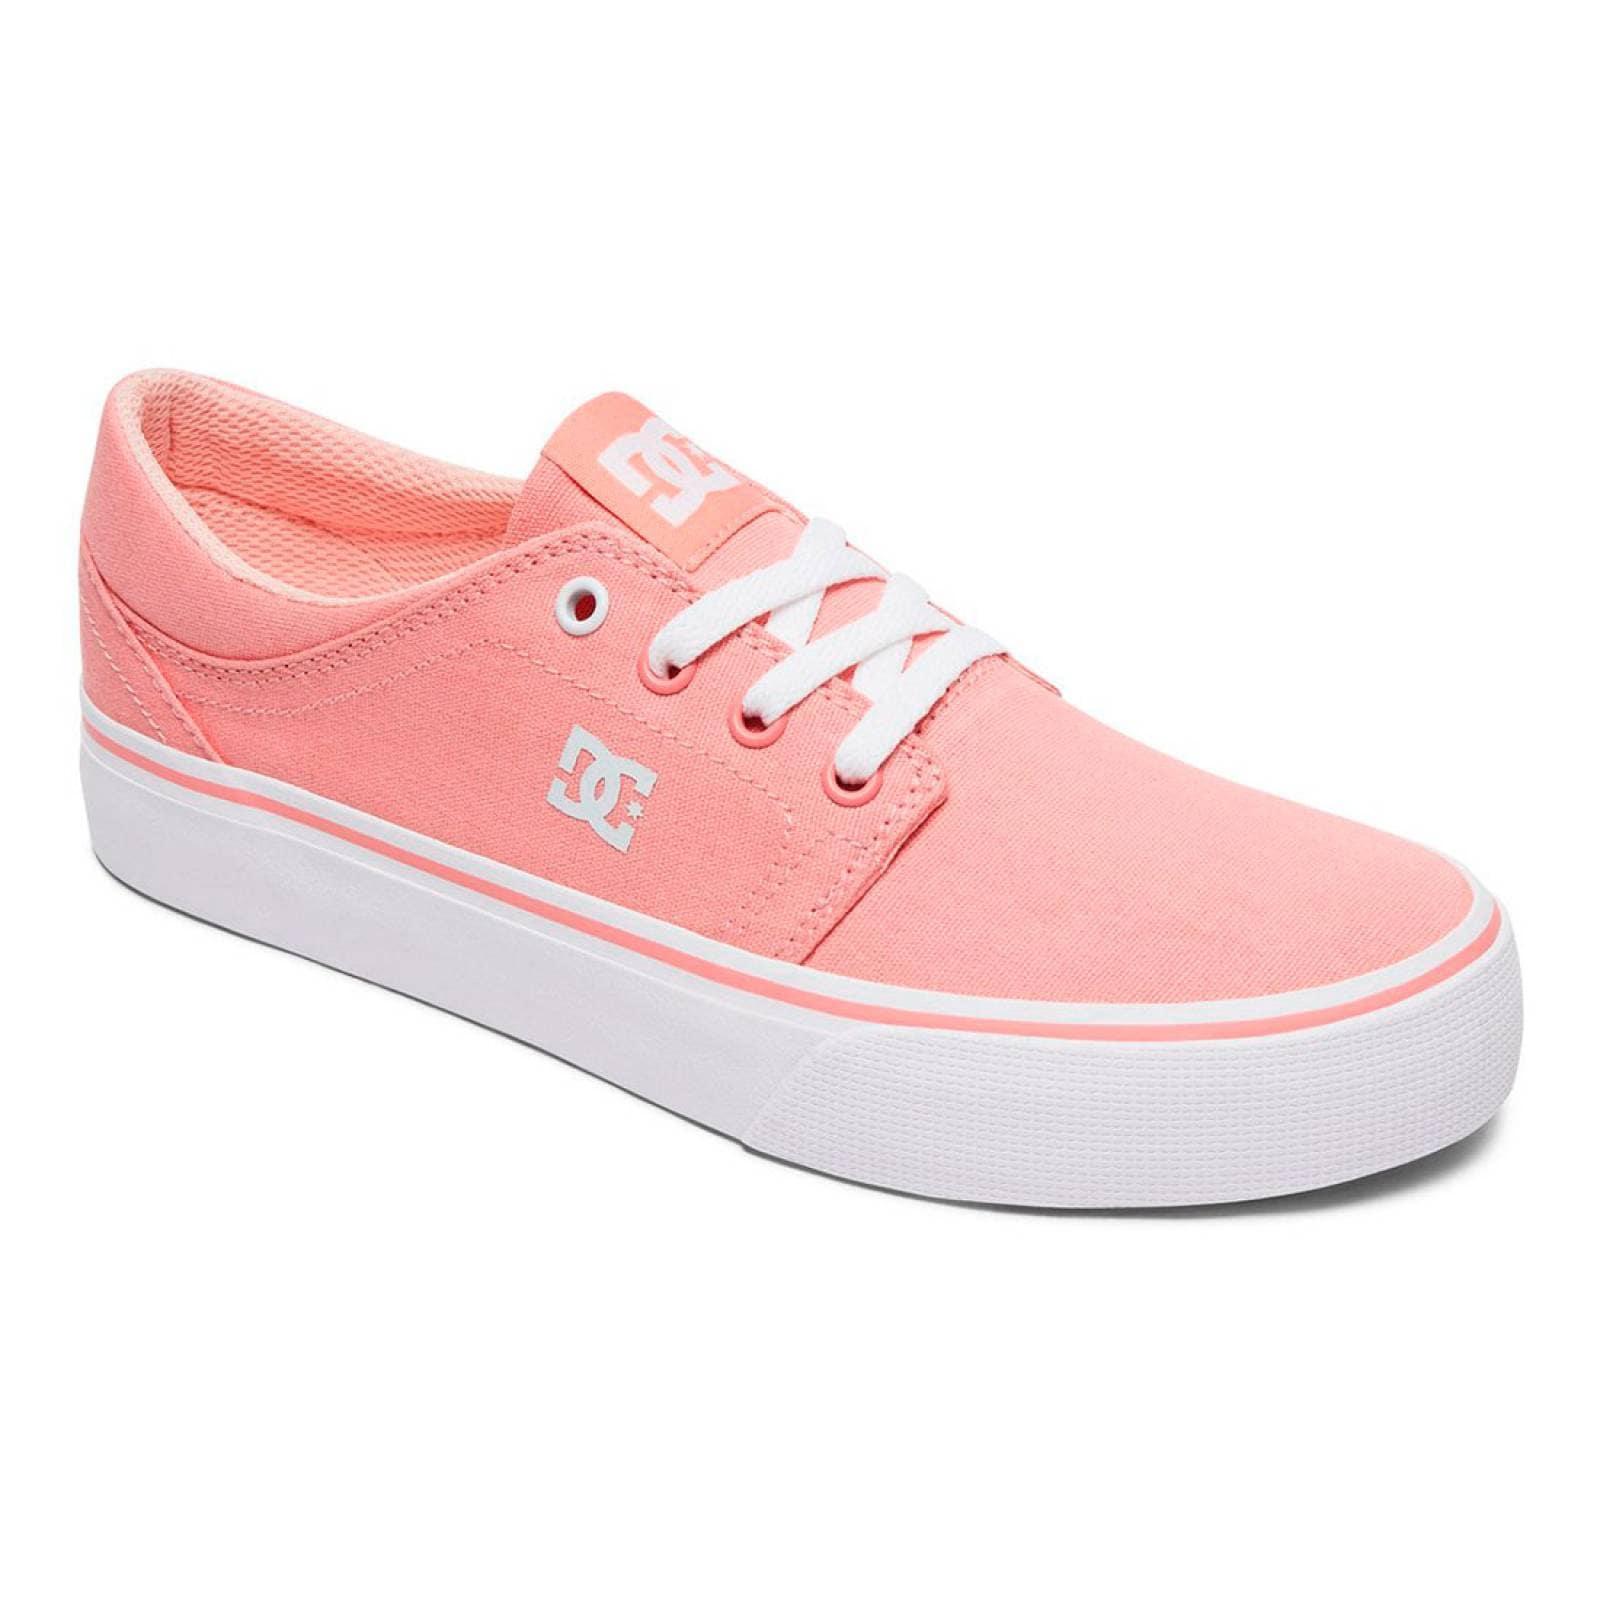 e69aa8197b Tenis casual mujer trase tx mx shoe adjs300208-rob dc shoes